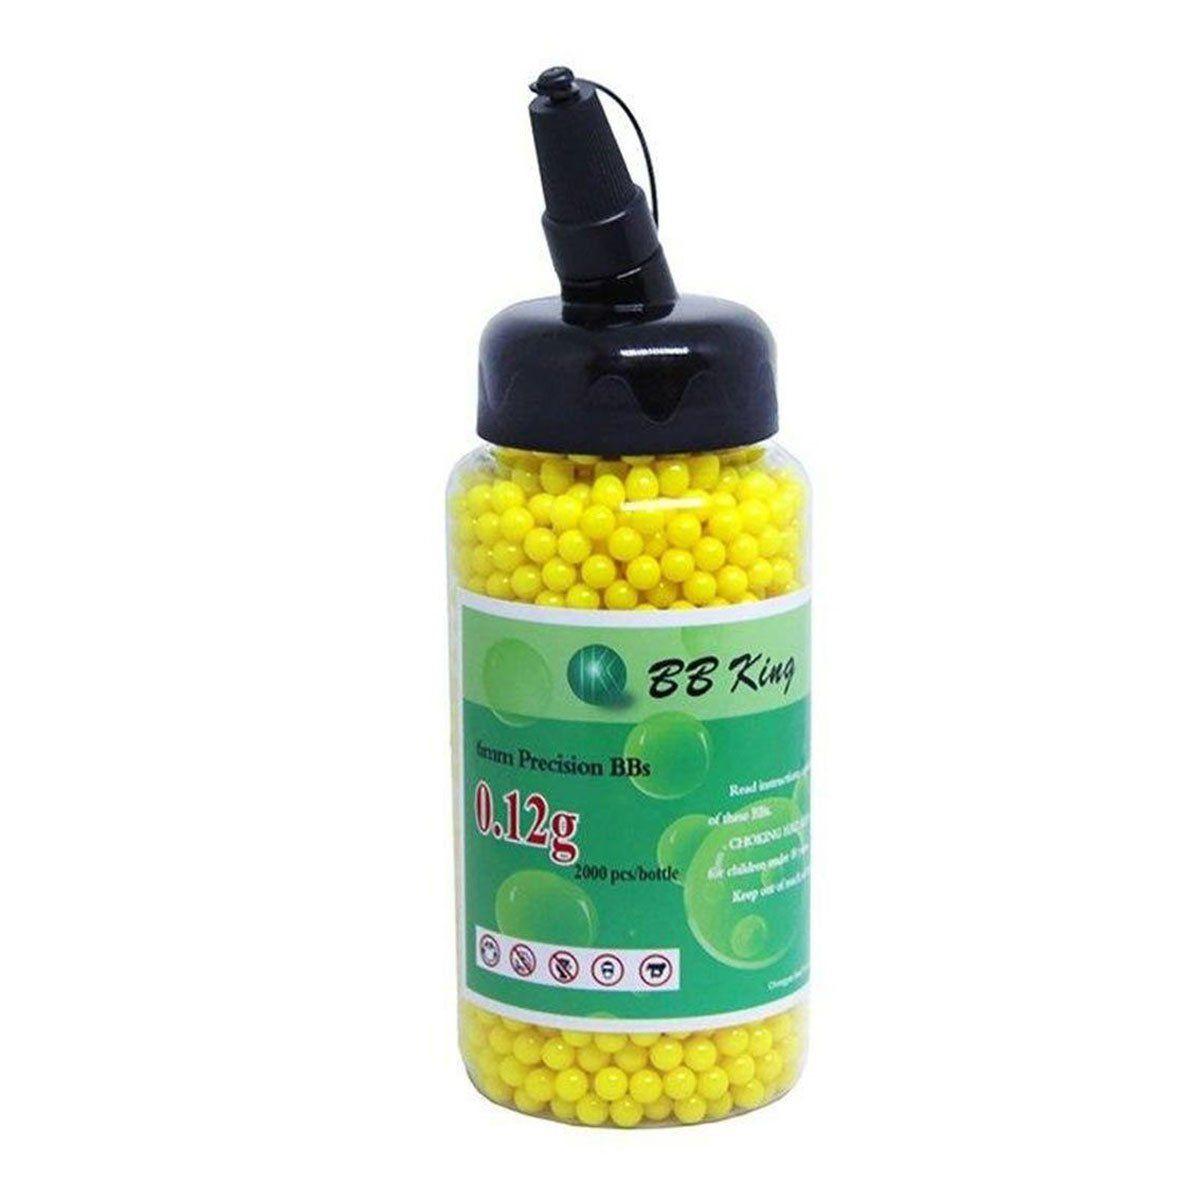 Esferas Plásticas BBs BB King Amarela Calibre 6mm 0,12g 2000un